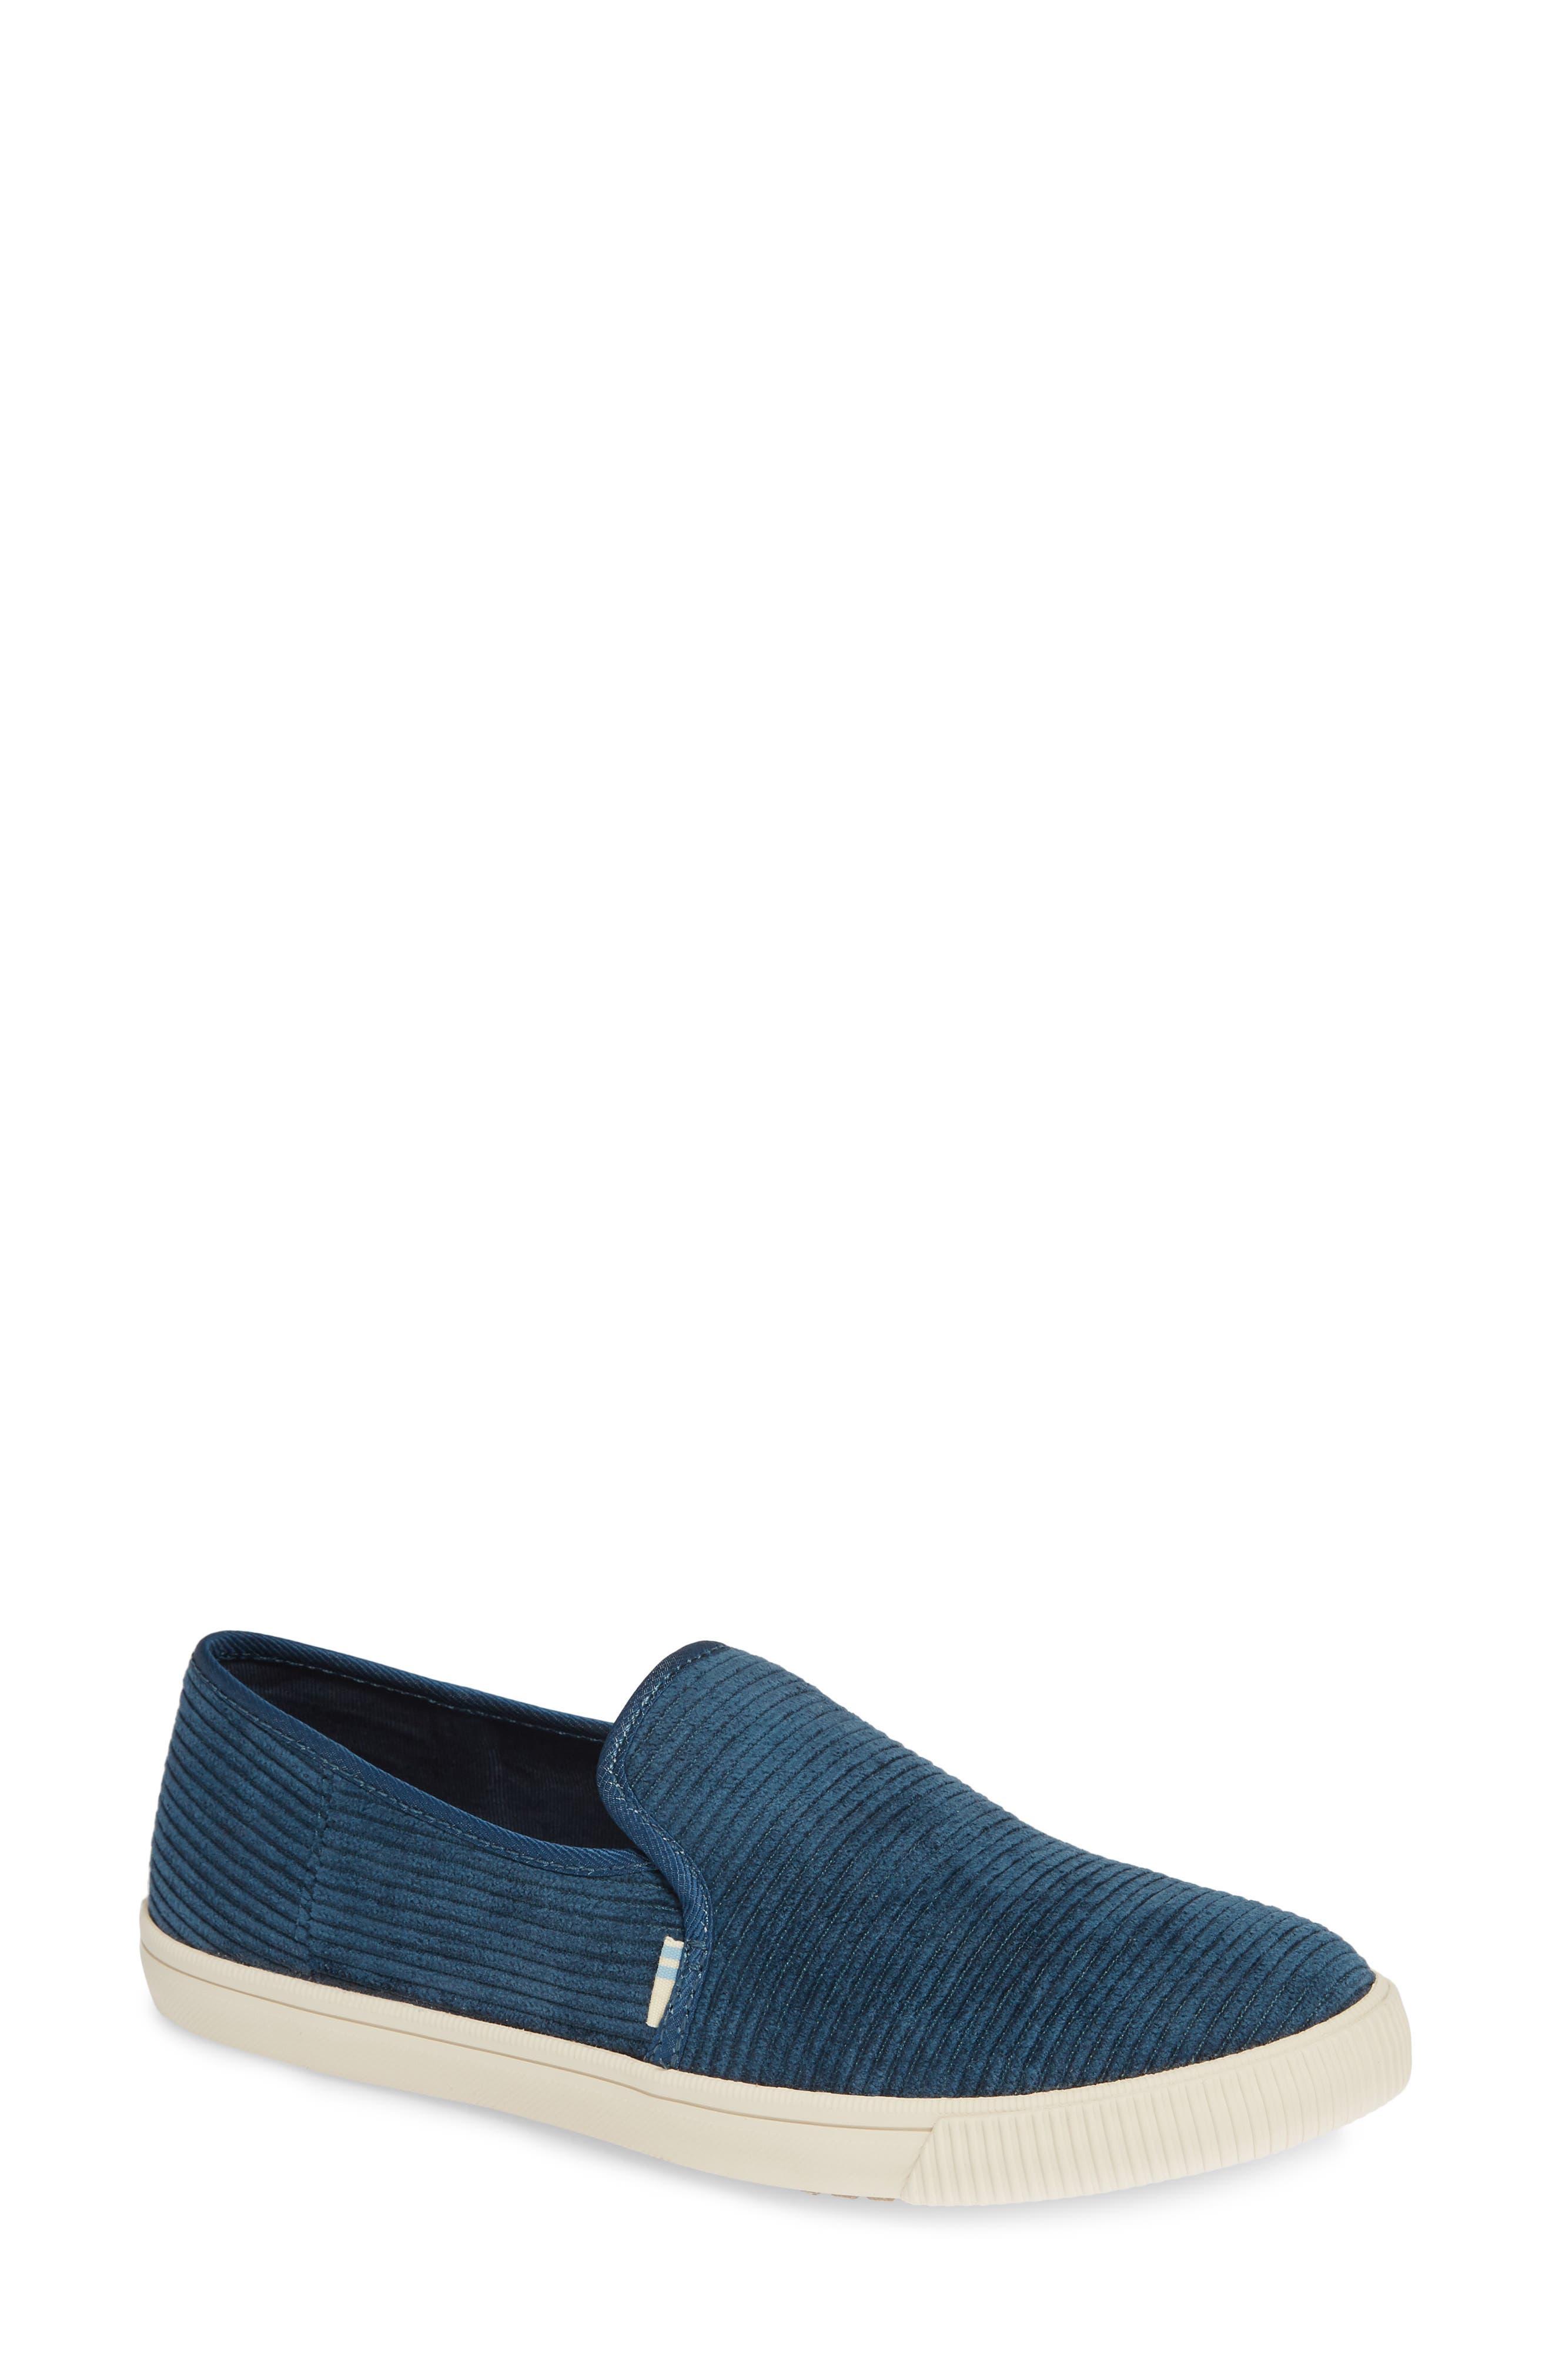 Toms Clemente Slip-On, Blue